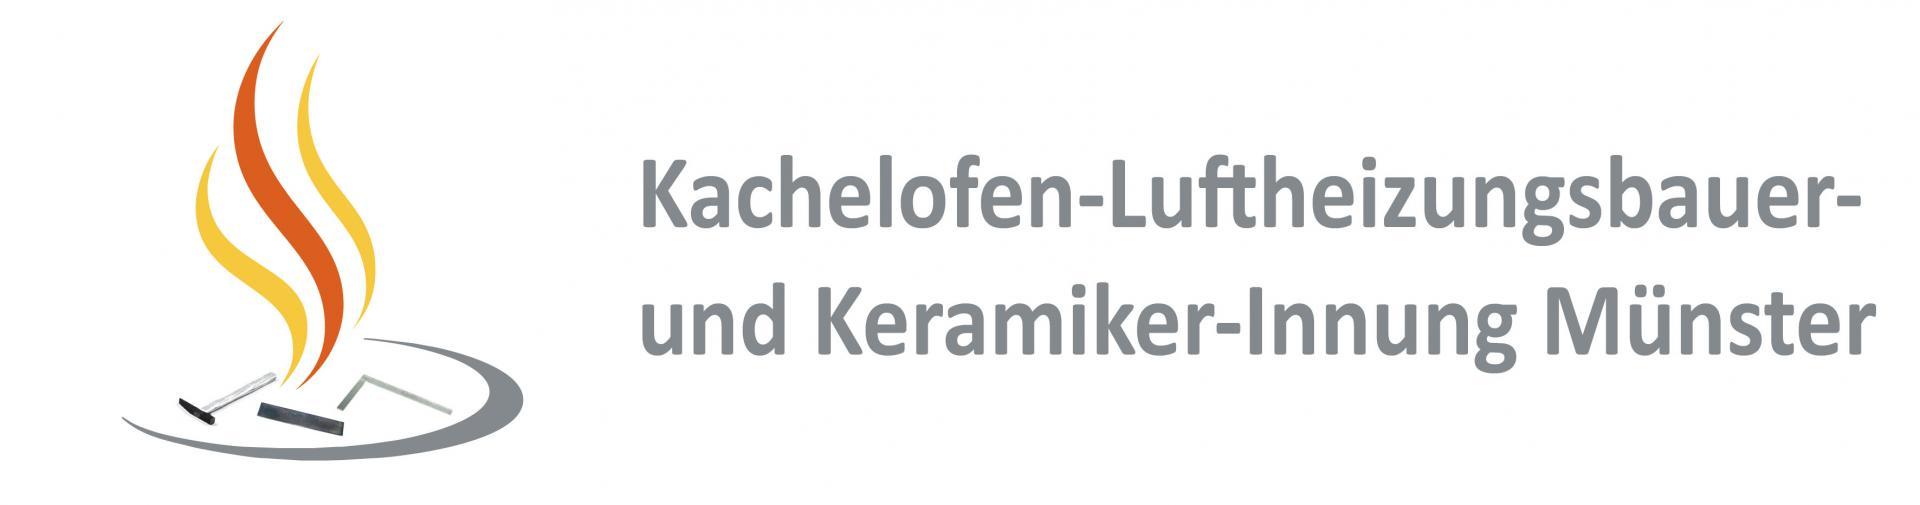 Kachelofen‐pp.‐Innung Münster